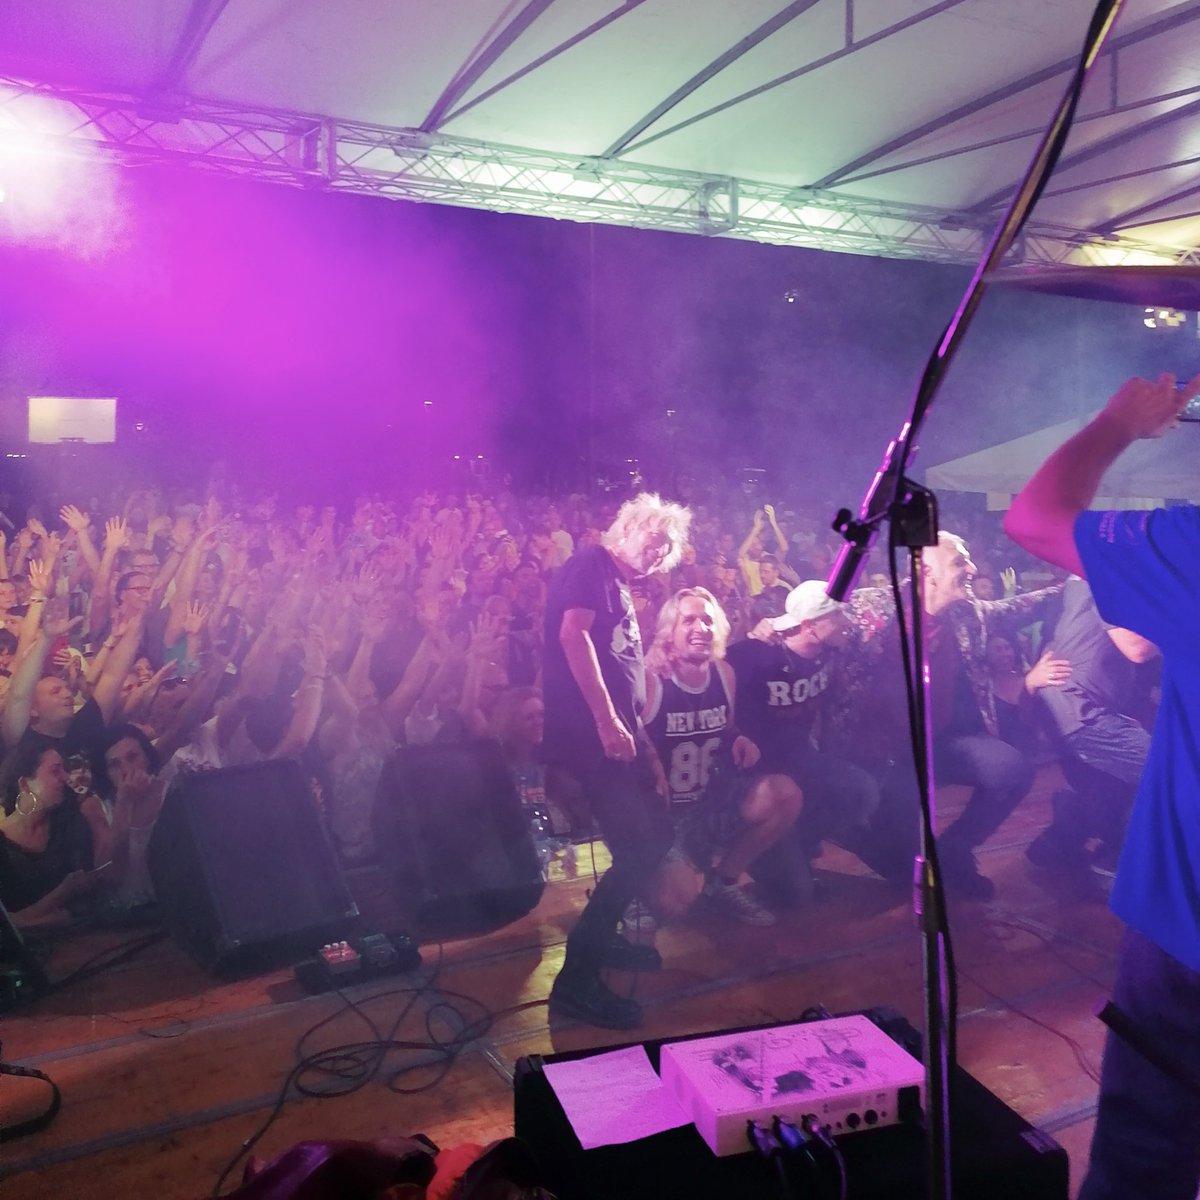 With the members of Vasco Rossi's band🙏🙏😍🎶🥁 #artistic  #guitar  #song  #musician  #band  #pop  #rockstar  #musicvideo  #songs  #musical  #festival  #group  #concert  #bands  #rocknroll  #rockband  #singer  #hardrock  #tagblender  #guitarist  #pianist  #musicals  #rockstars